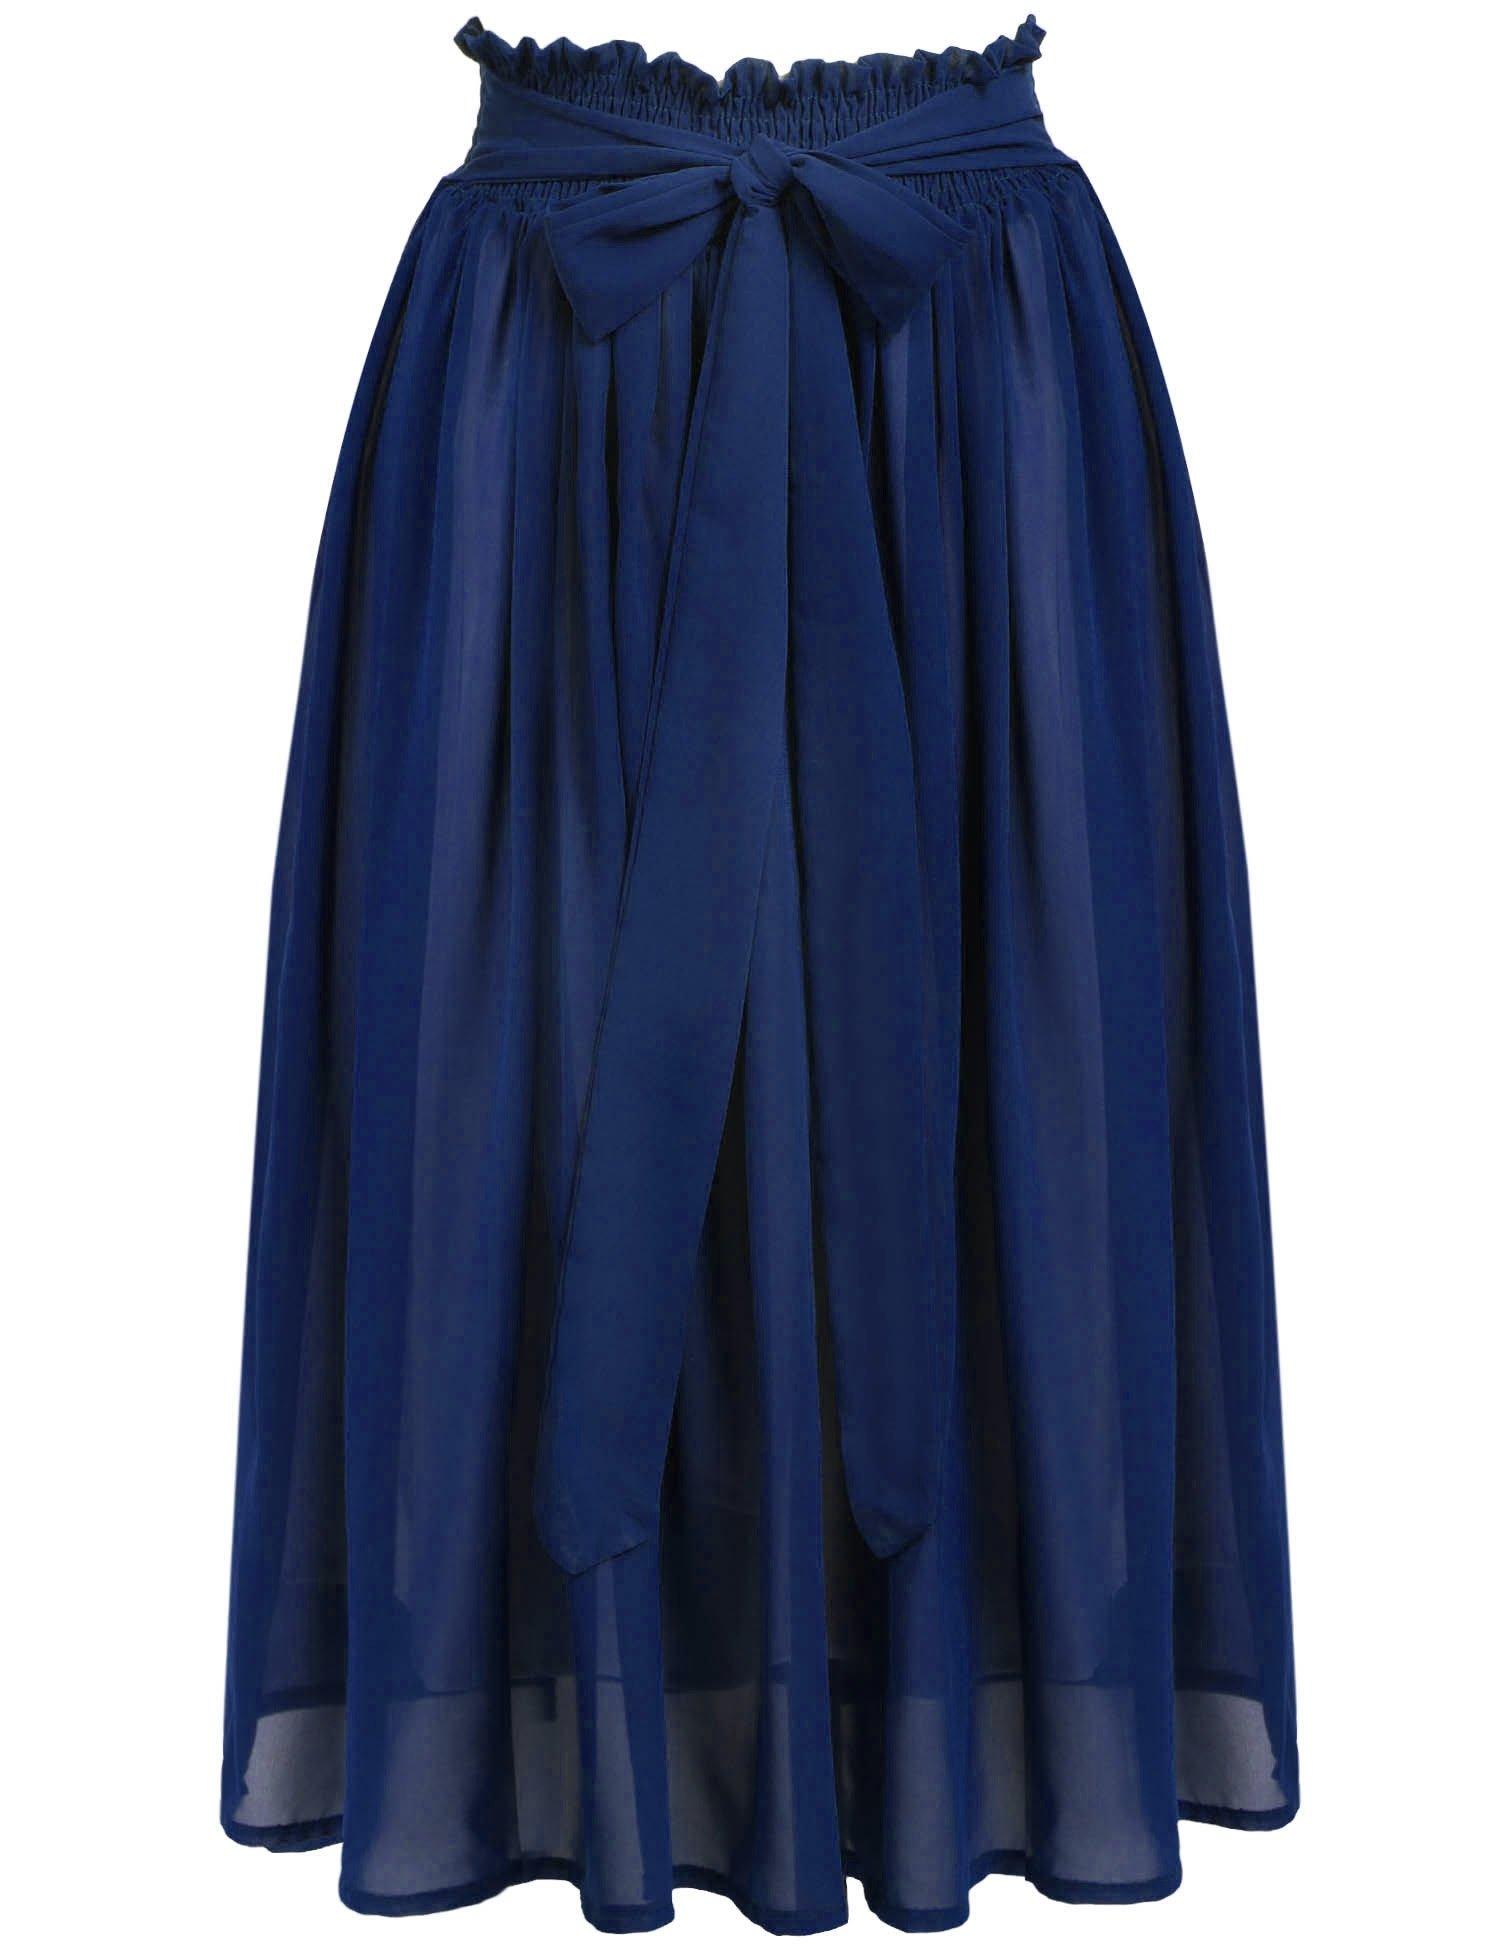 ACEVOG Women's Summer Chiffon Bowknot Pleated A-line Flare Midi Skirt Dress, X-Large, Blue